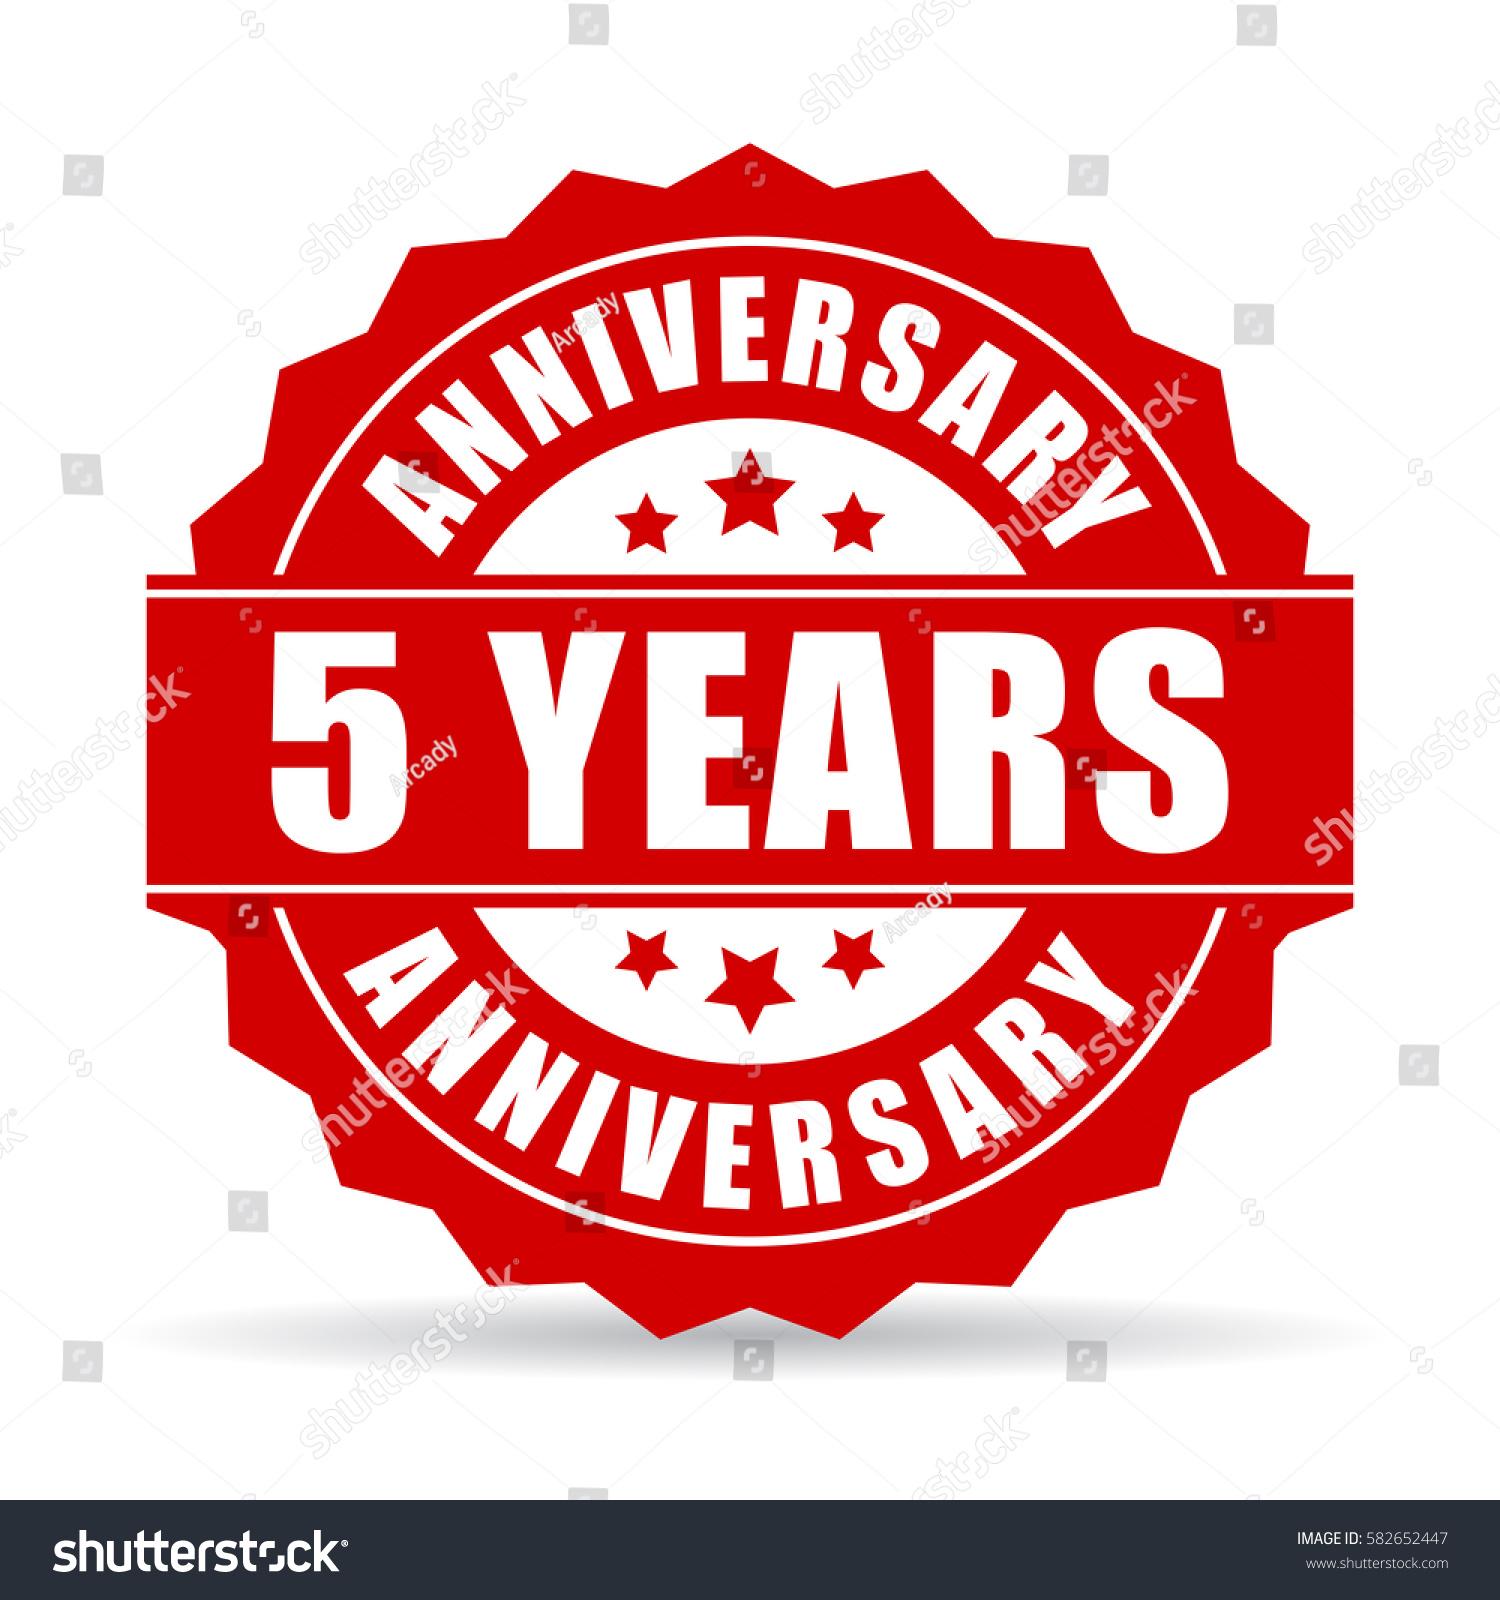 Five years anniversary celebration vector icon stock vector five years anniversary celebration vector icon biocorpaavc Choice Image